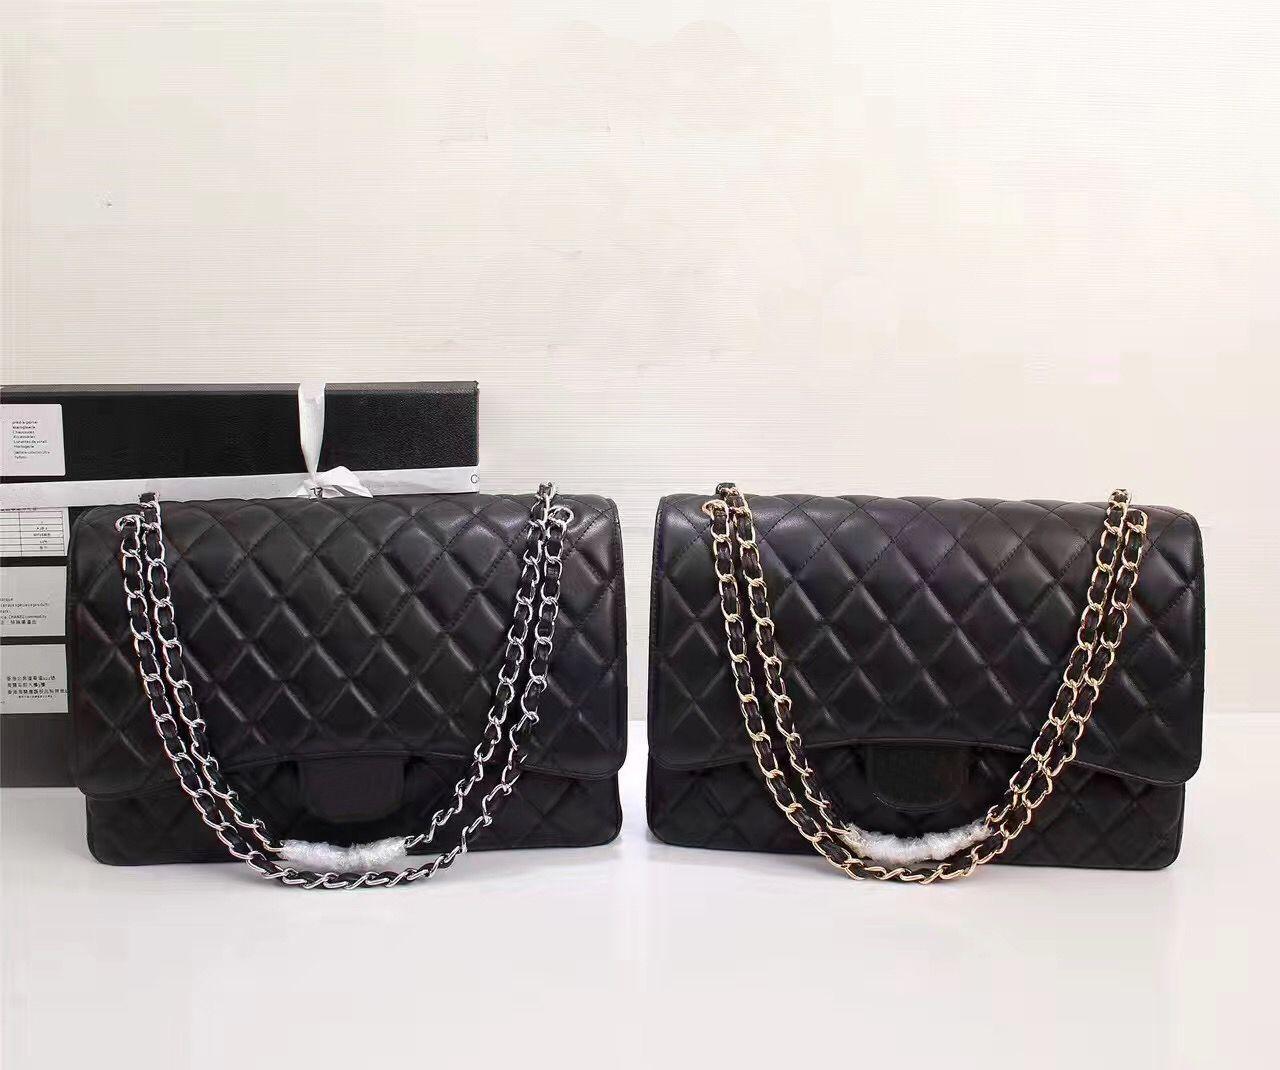 b0a69c91abbd Wholesale Orignal 33cm Real Sheep Leather Caviar Fashion Famous Chain Shoulder  Bag Luxury Handbag CF Maxi Purse Evening Bag Messenger Messenger Bag  Evening ...